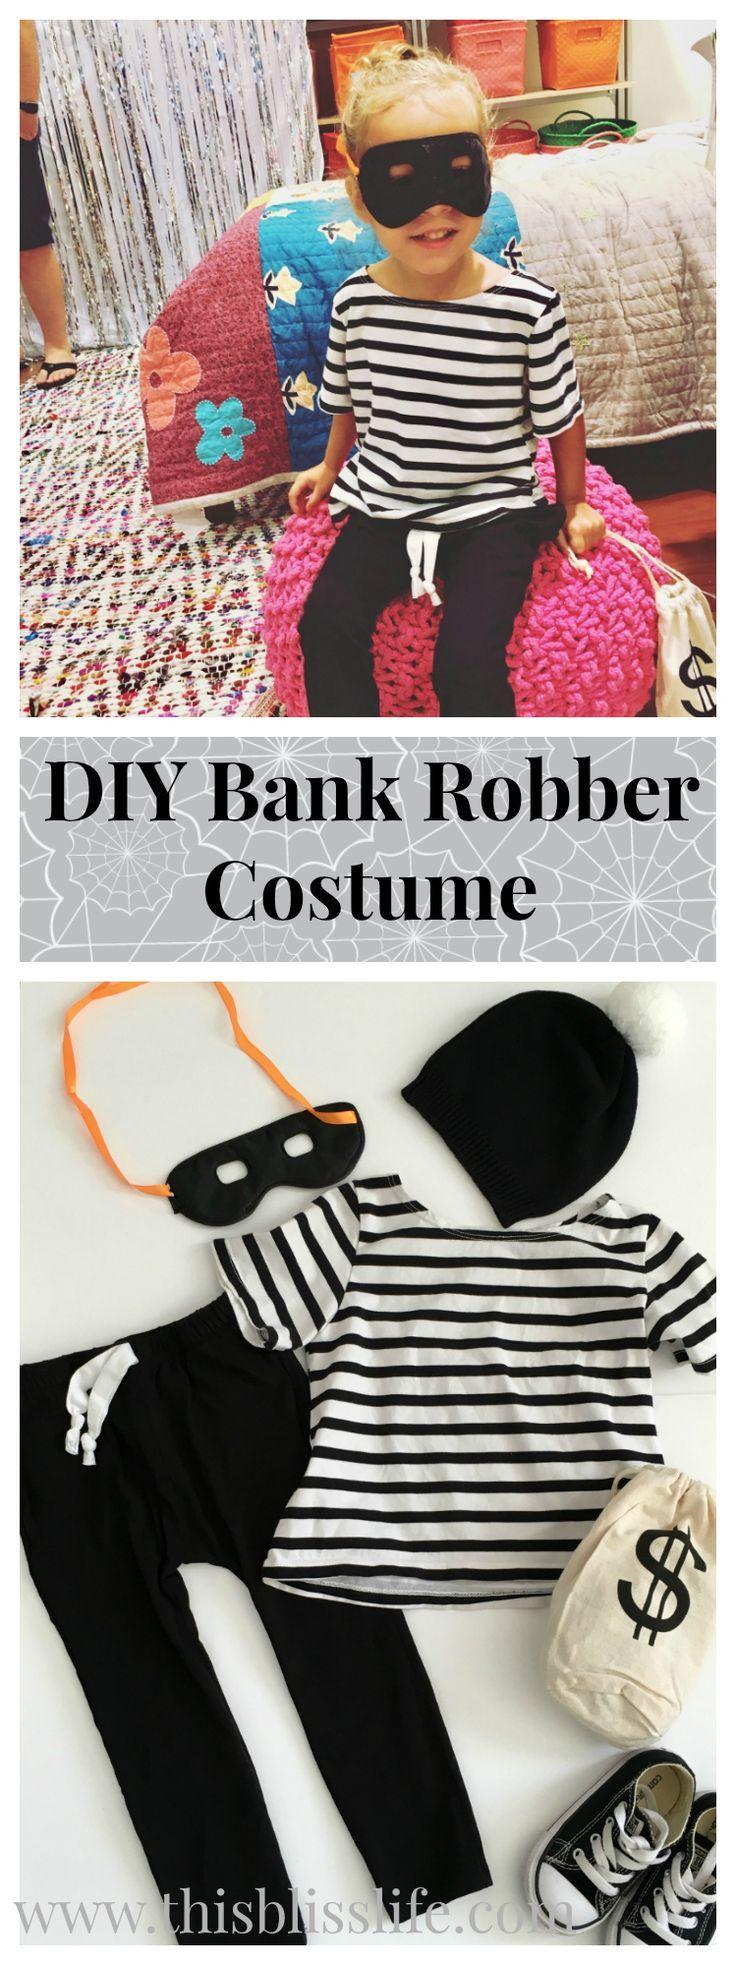 DIY Bank Robber Costume for Kids! | www.thisblisslife.com